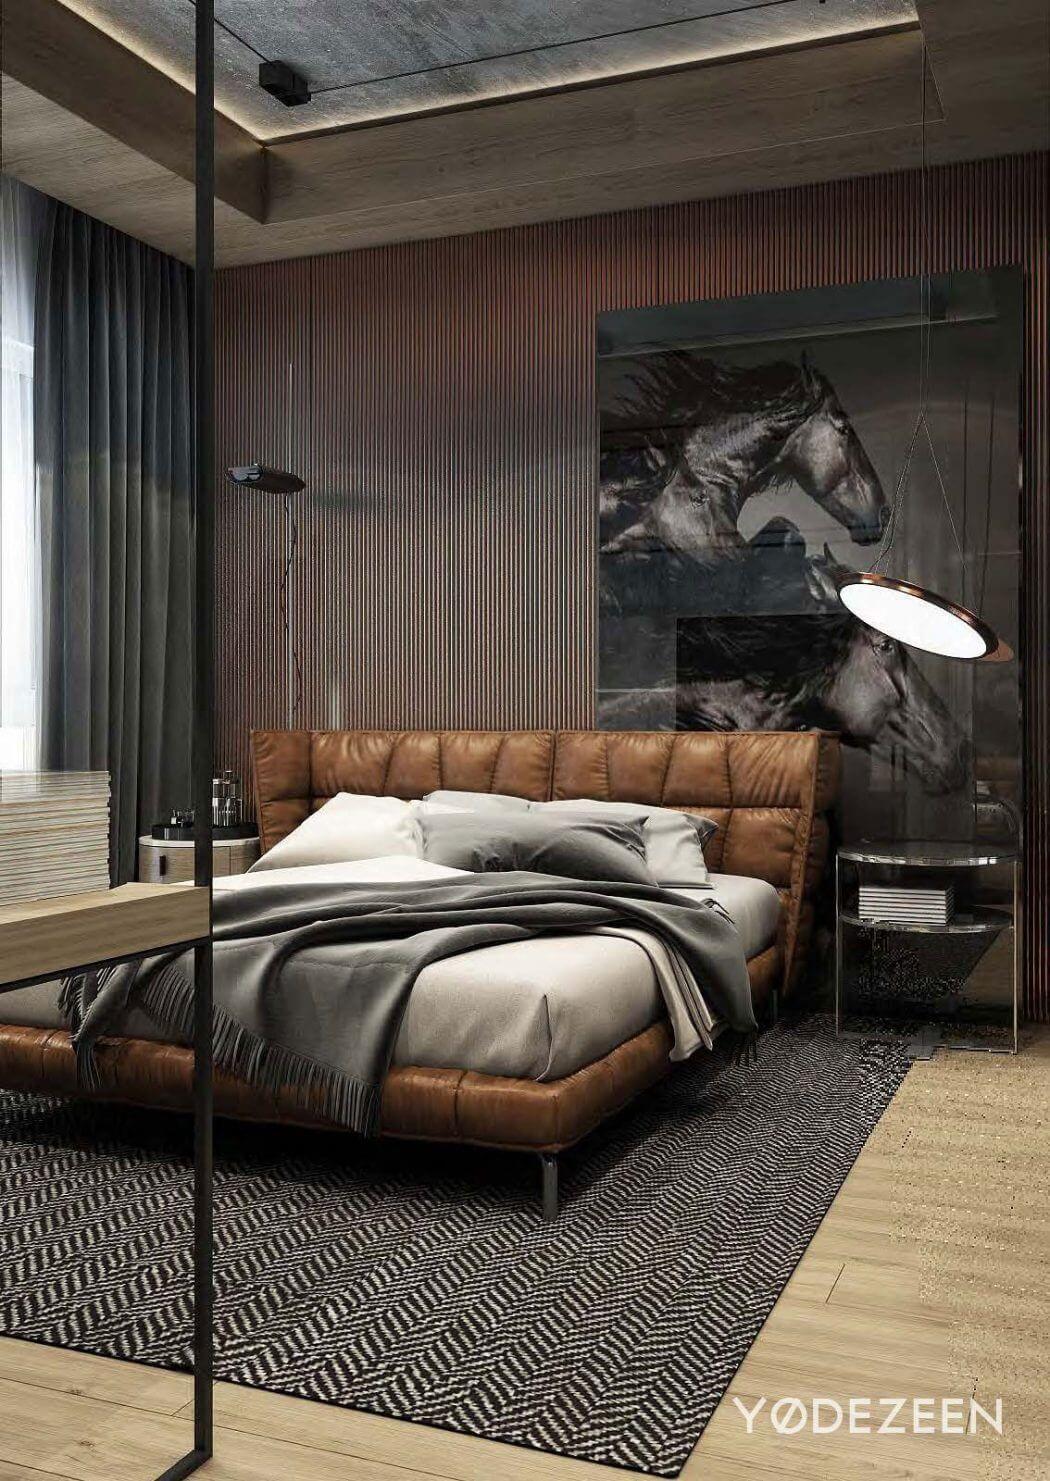 Residence In Tbilisi By Yodezeen Designs Homeadore Luxurious Bedrooms Men S Bedroom Design Leather Bedroom